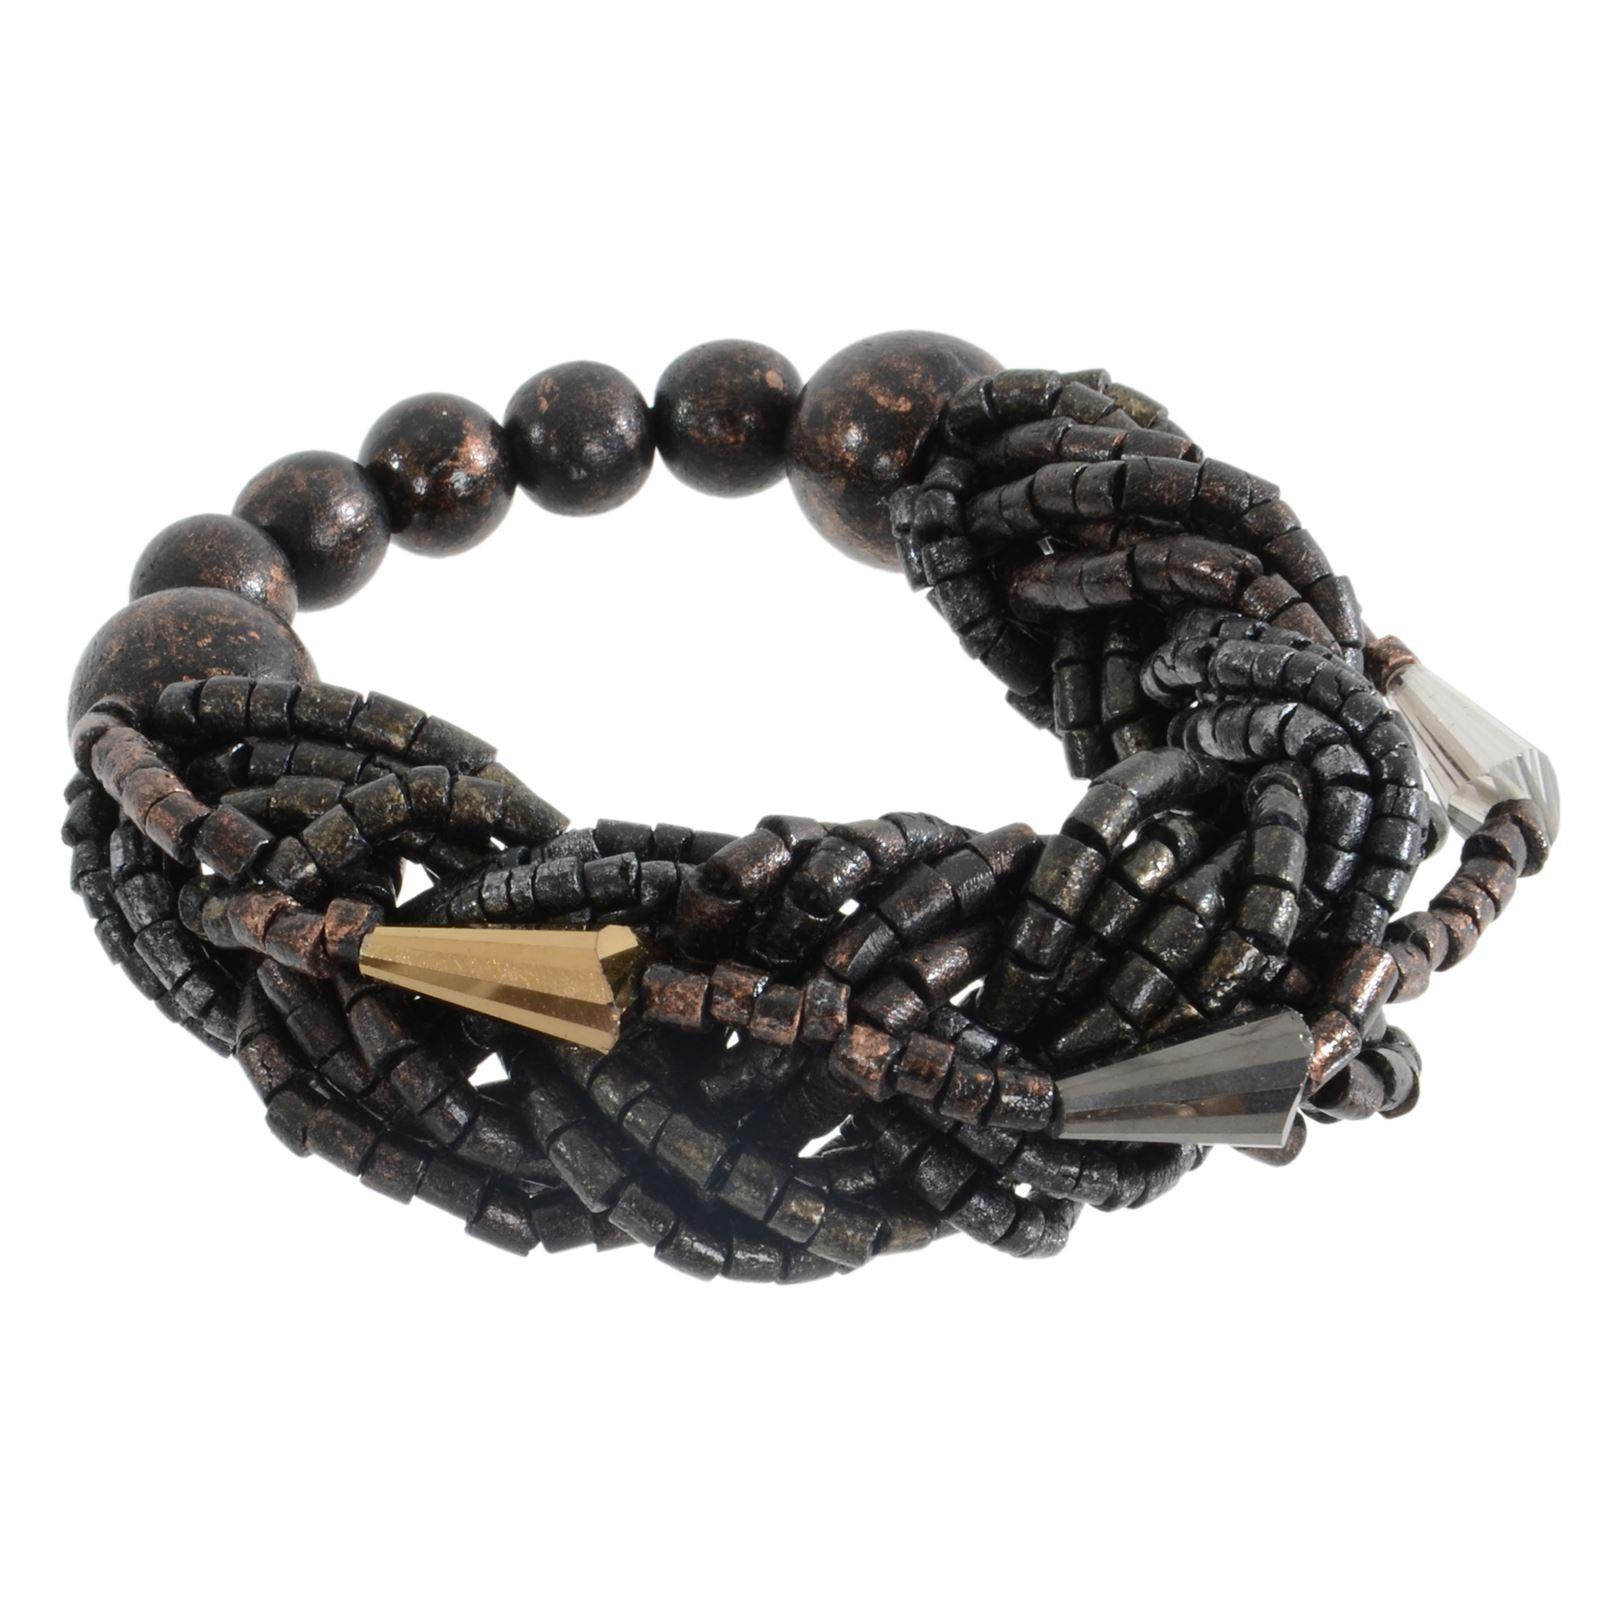 Pia Rossini Lois Bracelet Chunky Beads Strands Stretch Fit Beach Summer Wrist